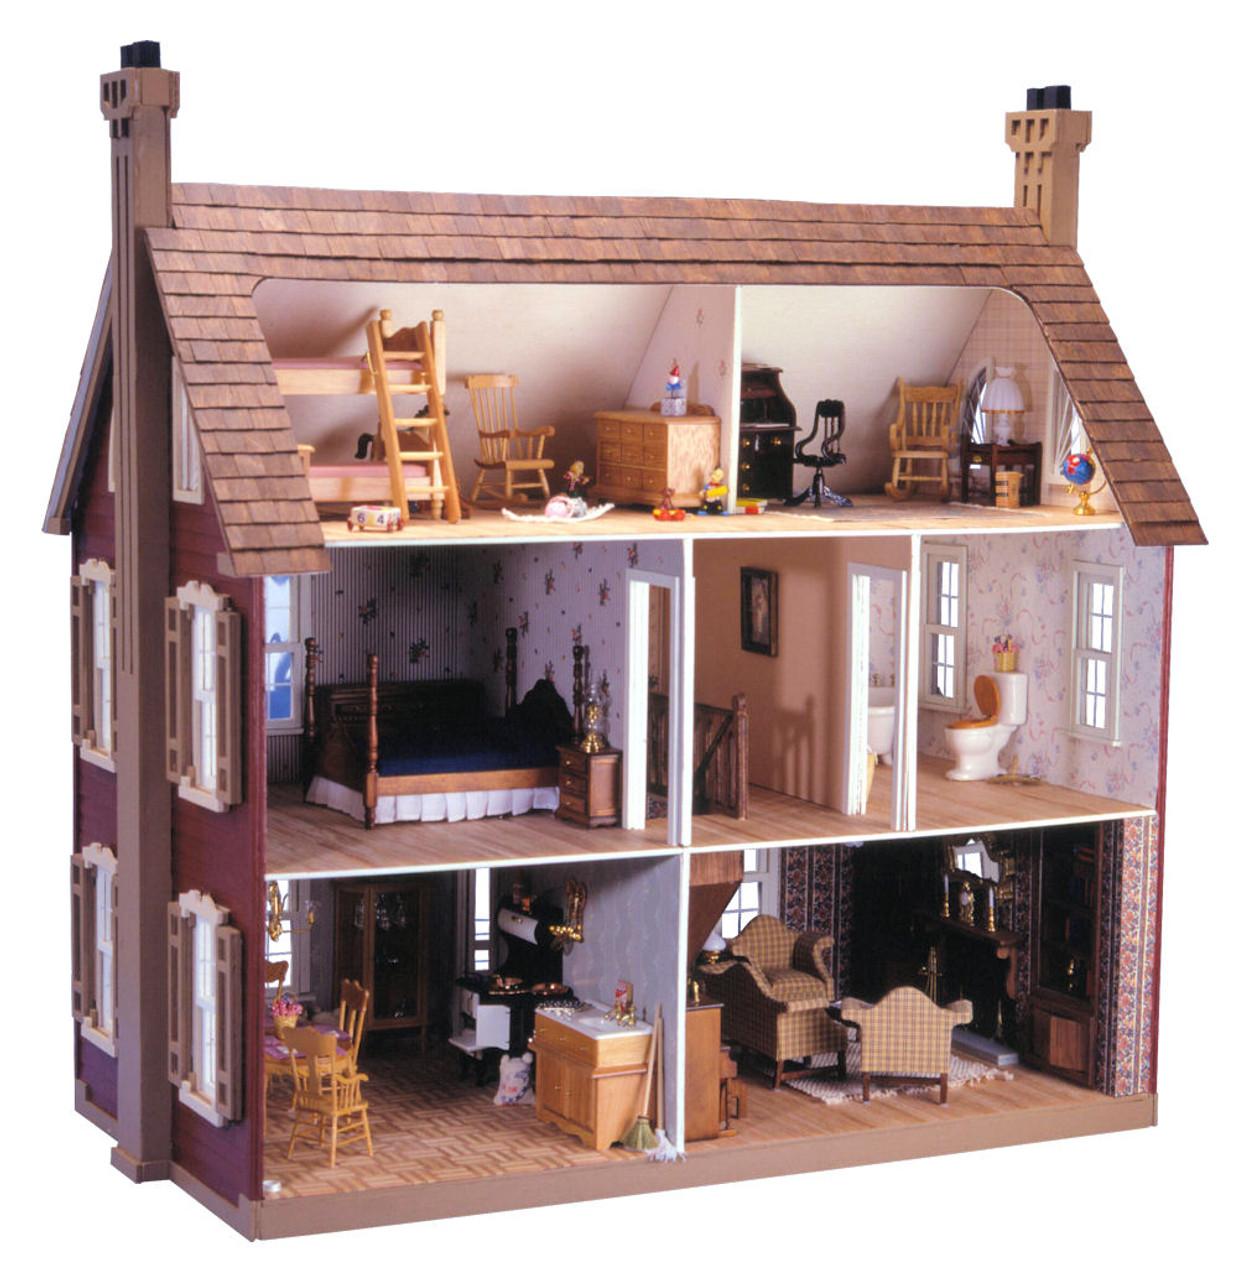 Willow dollhouse kit solutioingenieria Choice Image